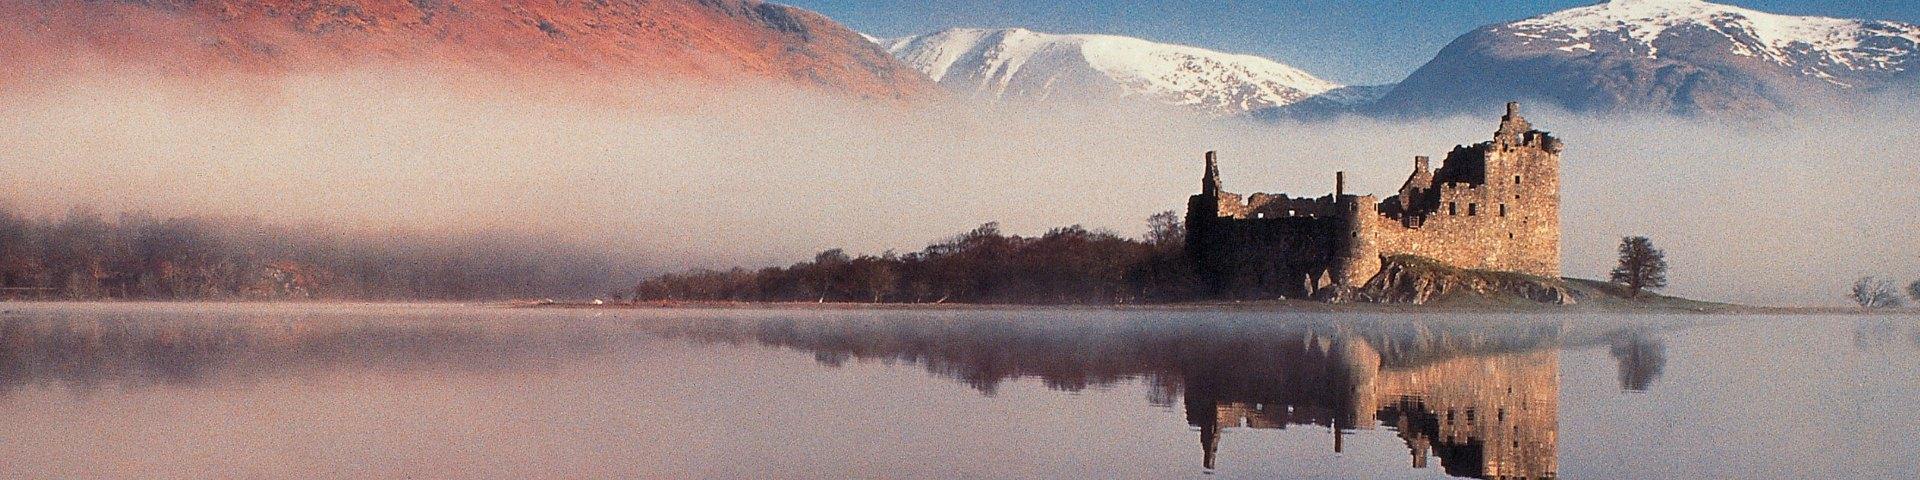 Kilchurn Castle by Loch Awe, Argyll in winter